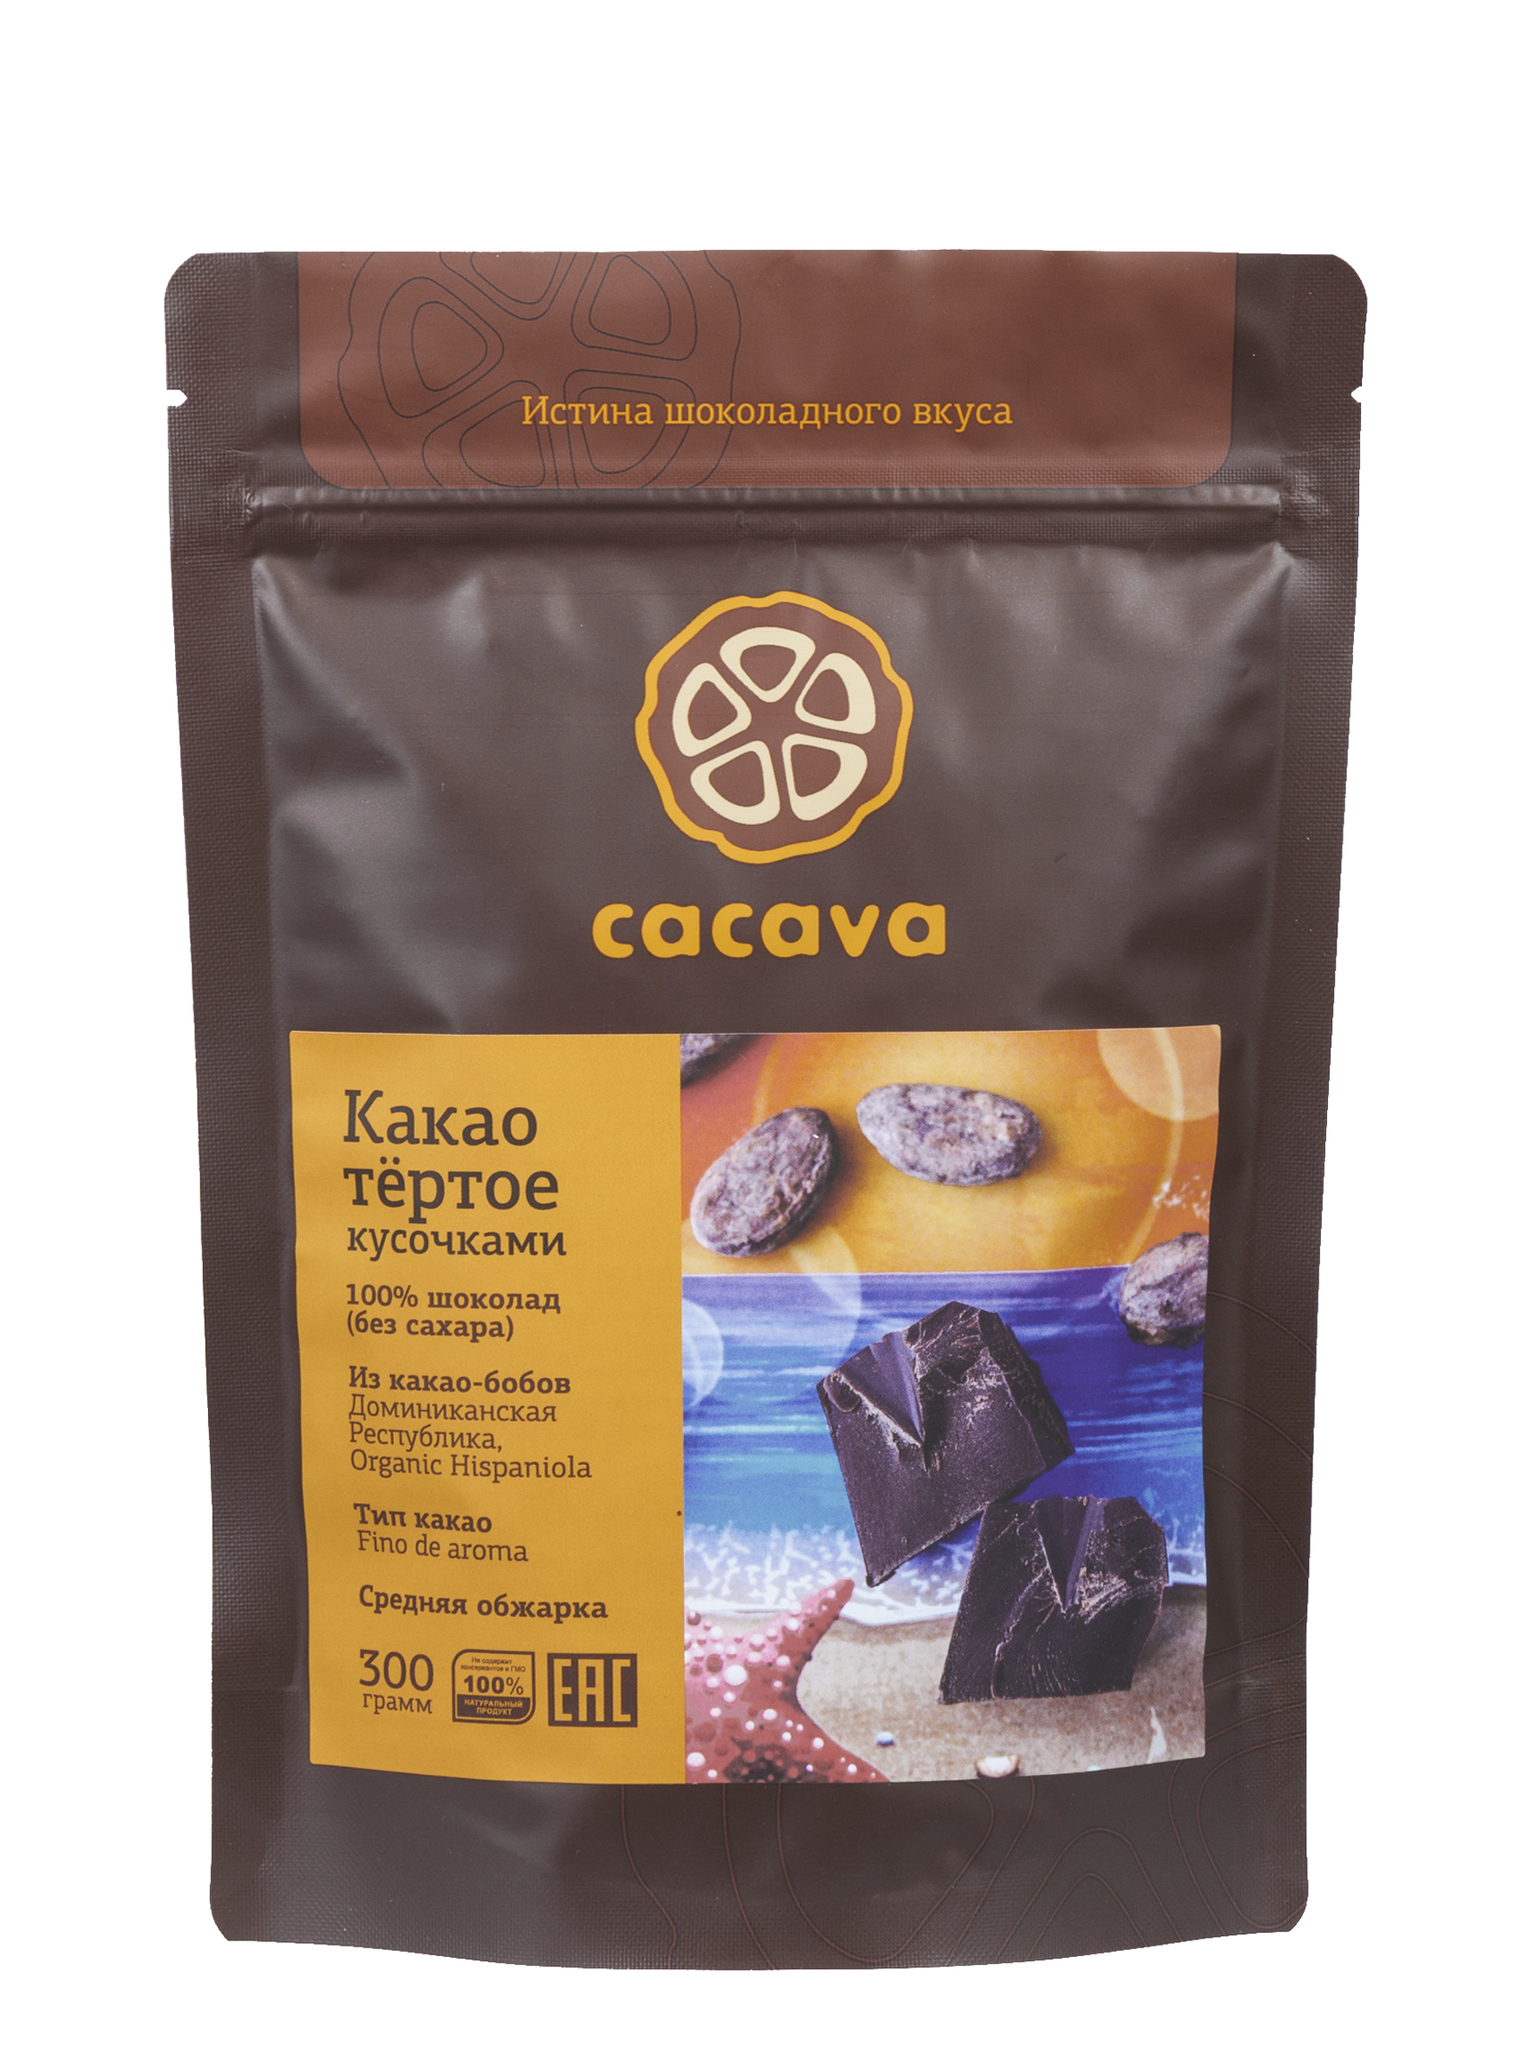 Какао тёртое кусочками (Доминикана), упаковка 300 грамм